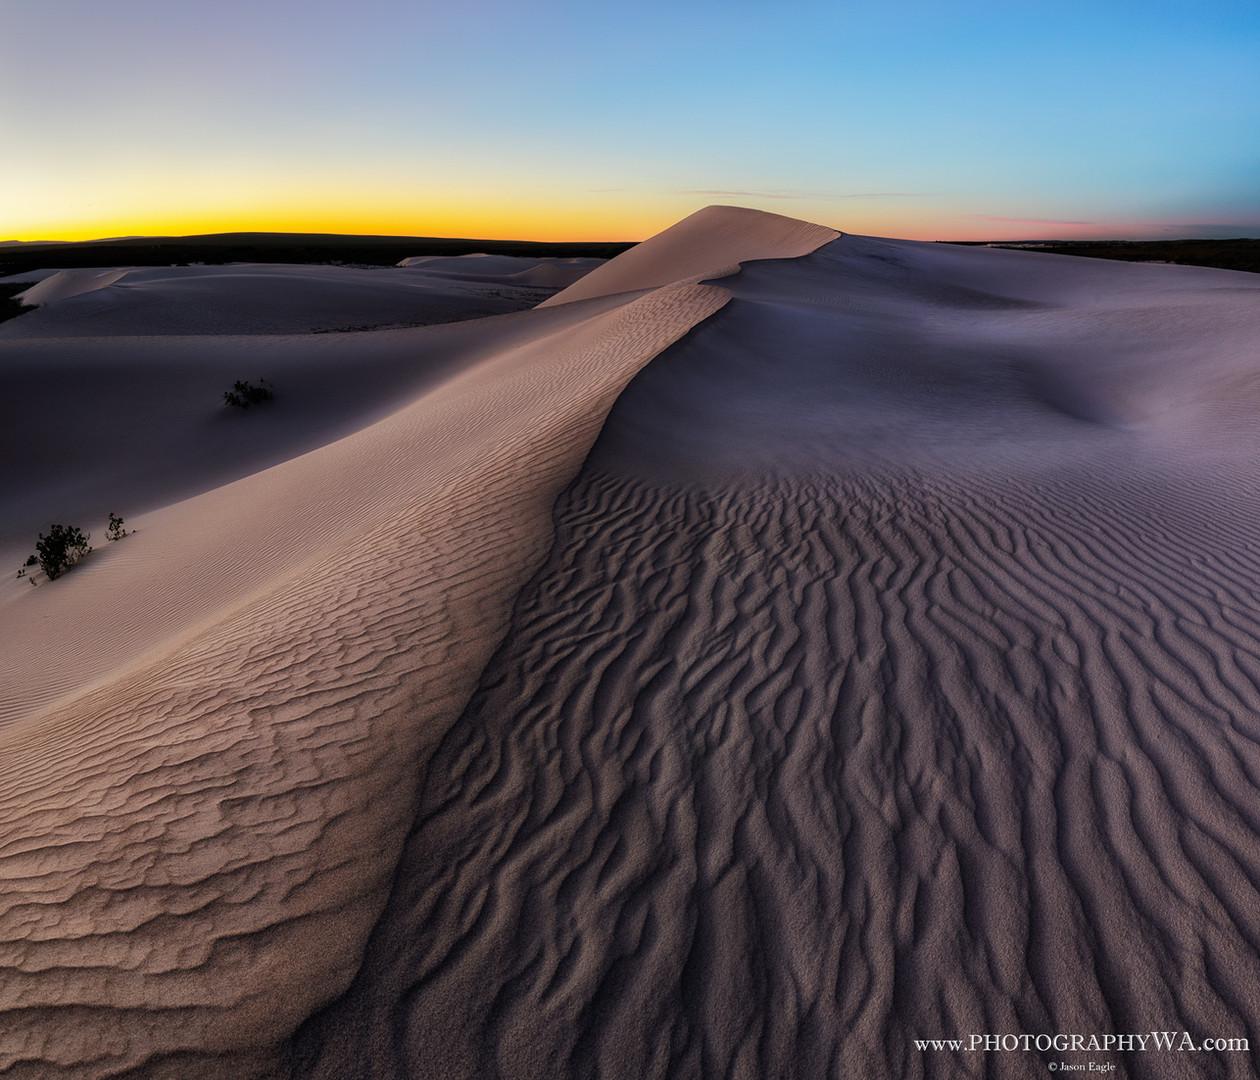 JurienBay Sand Dunes